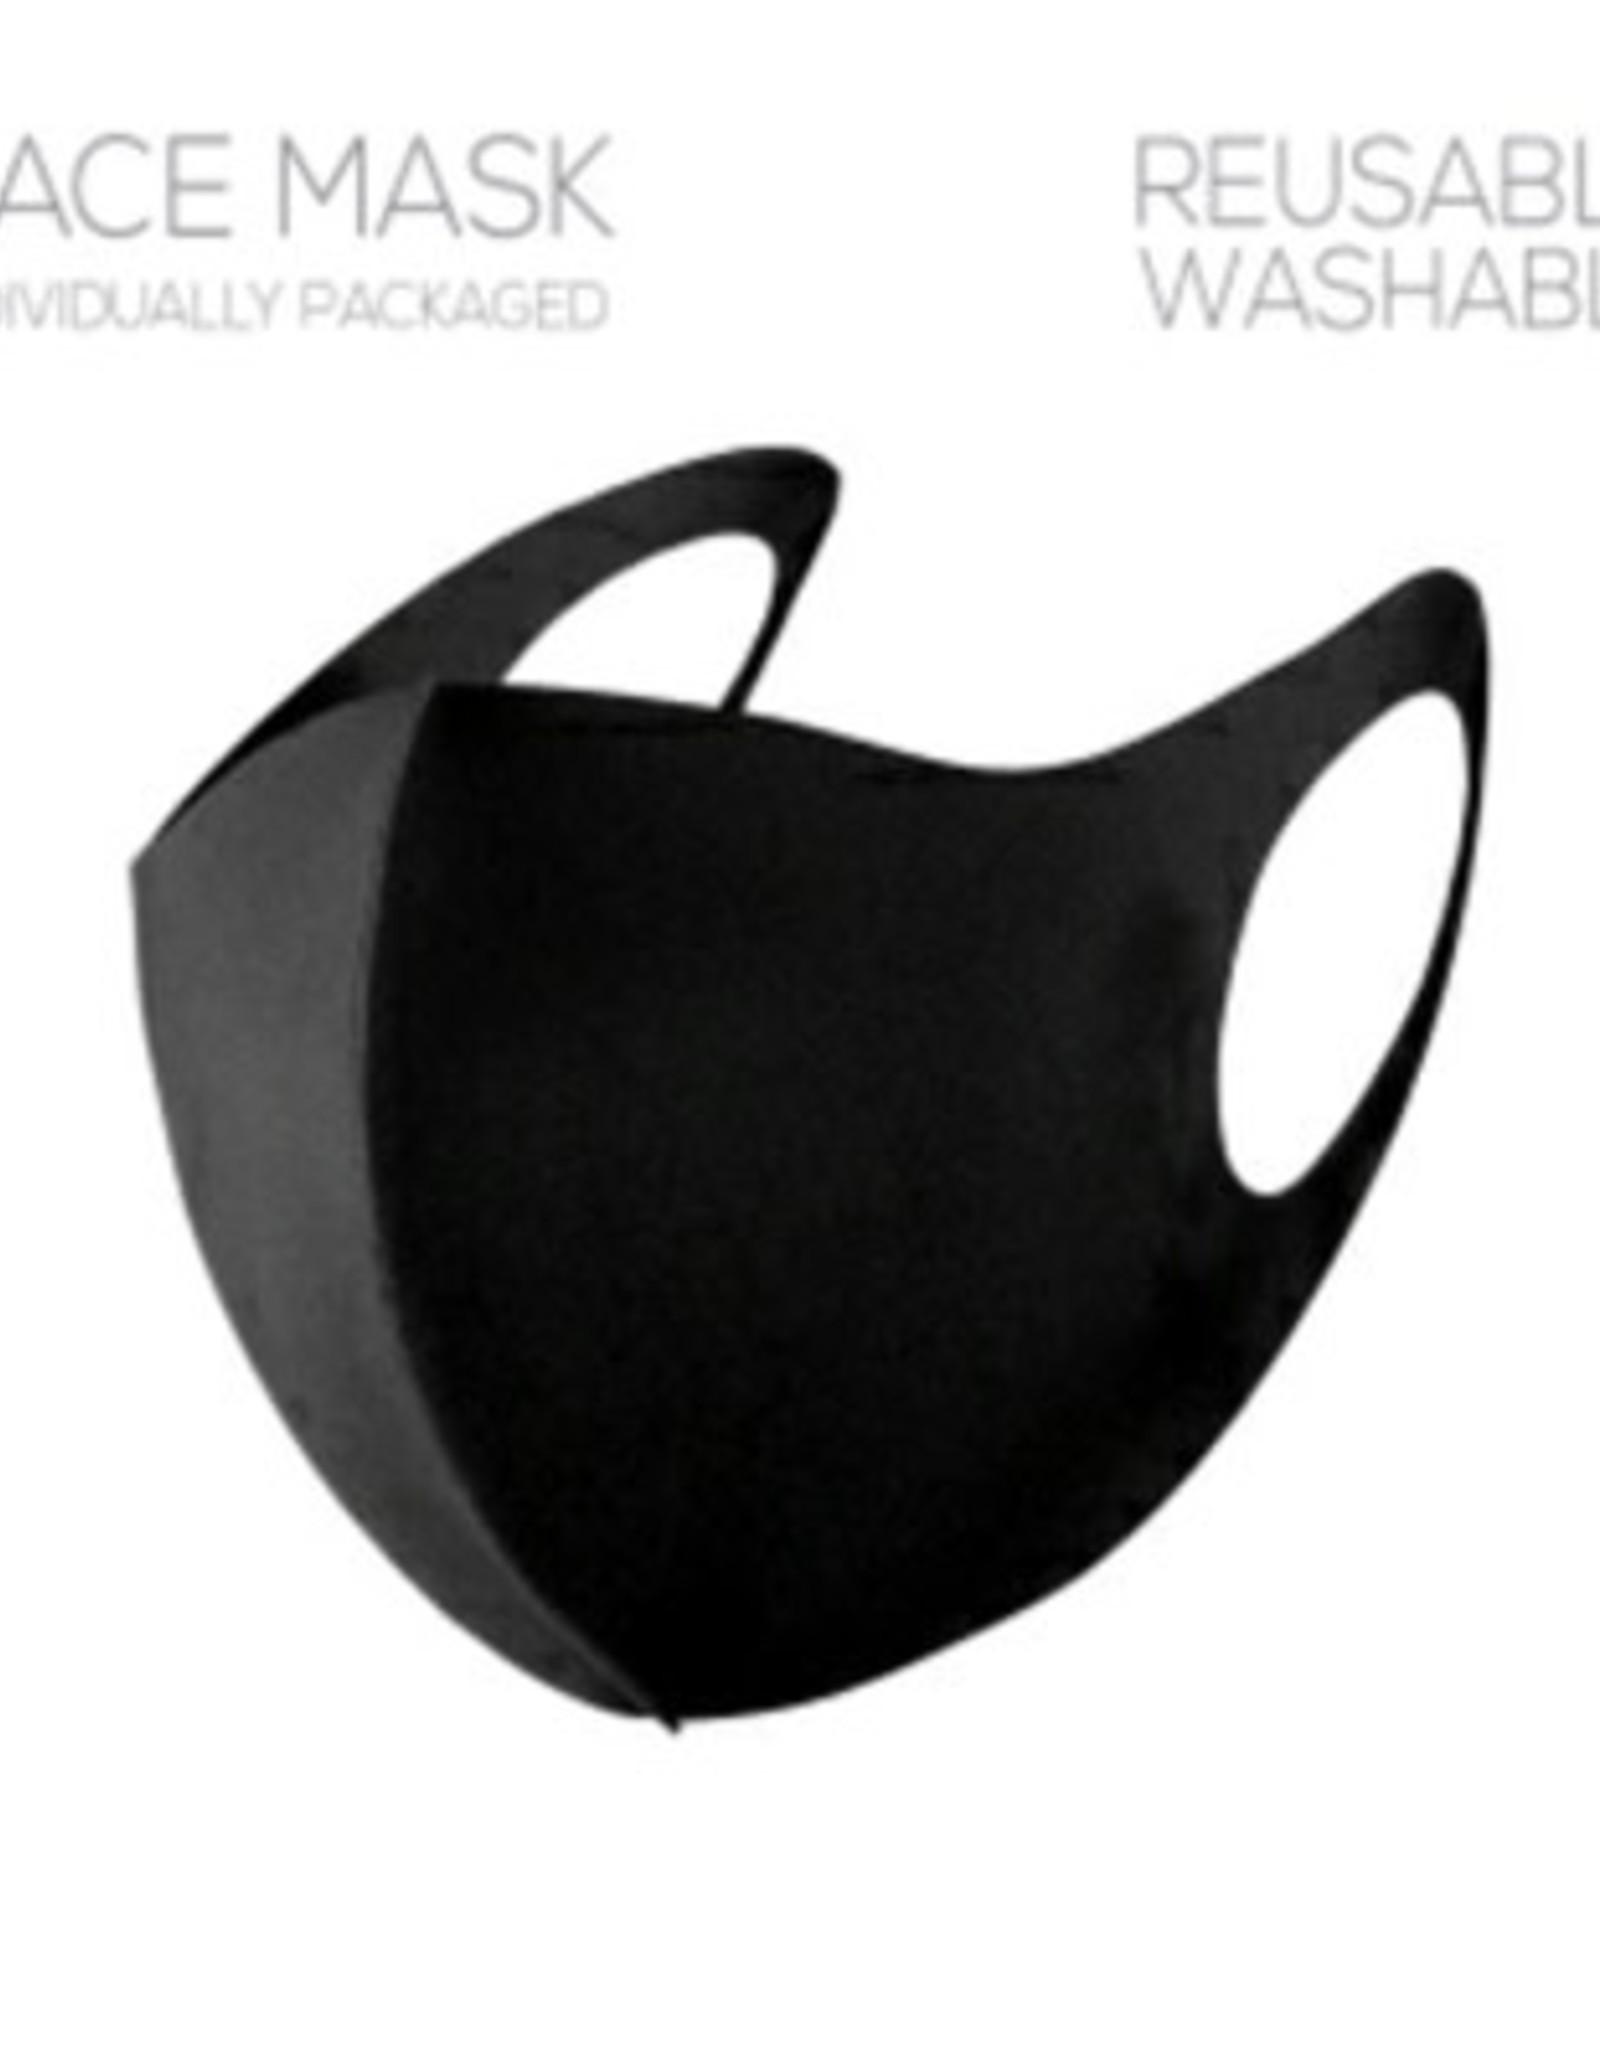 What's Hot Plain Black Face Mask